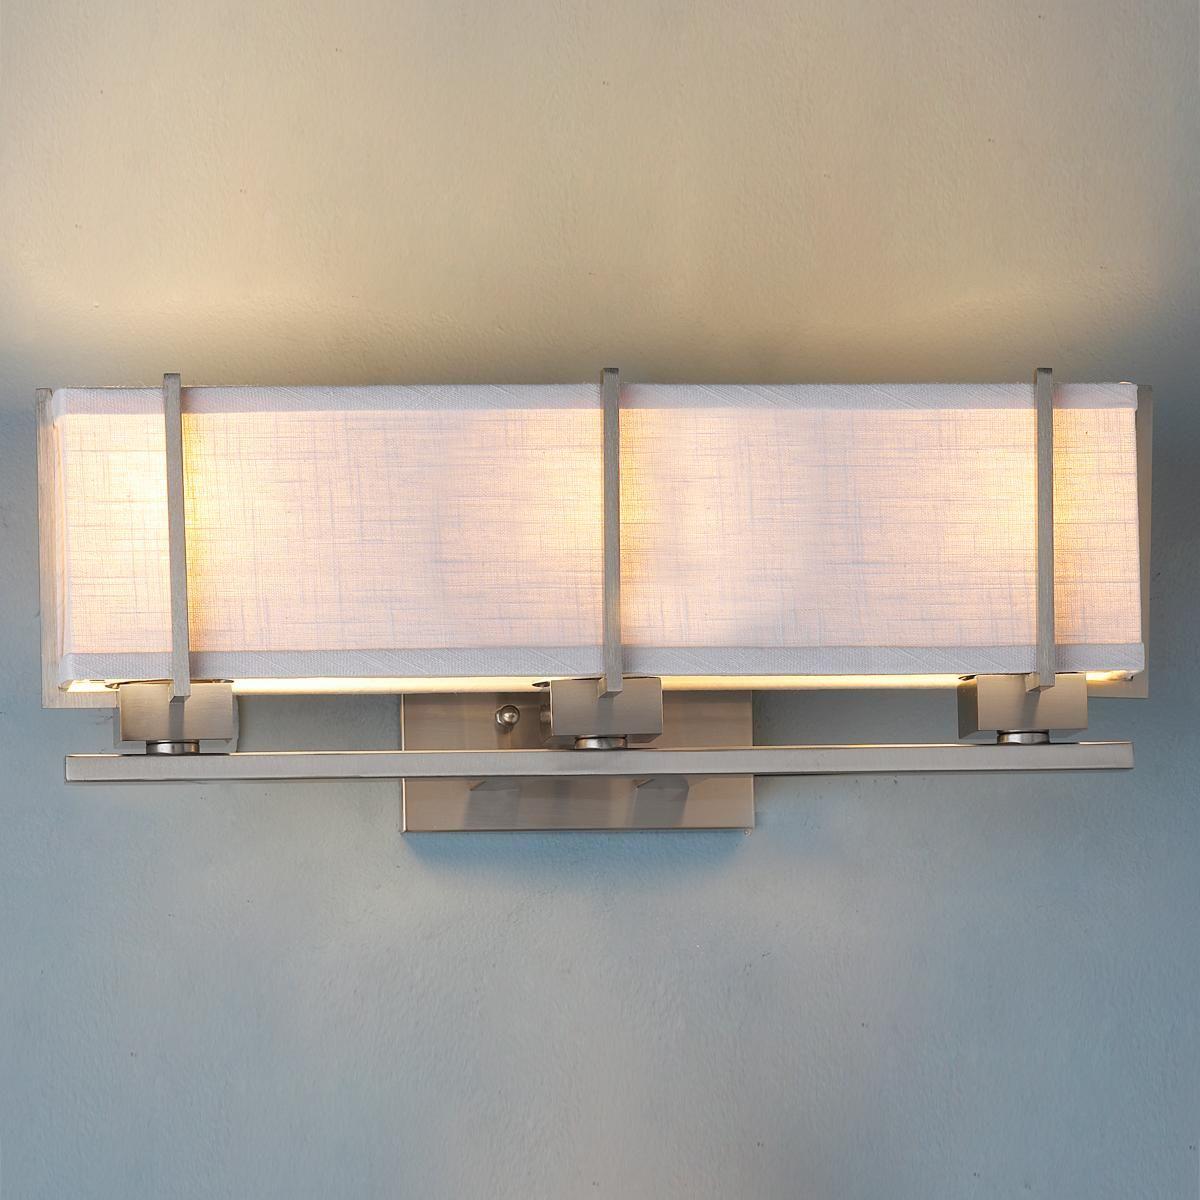 13 Dreamy Bathroom Lighting Ideas: Energy Star Linen Box Shade Bath Vanity Light Brushed